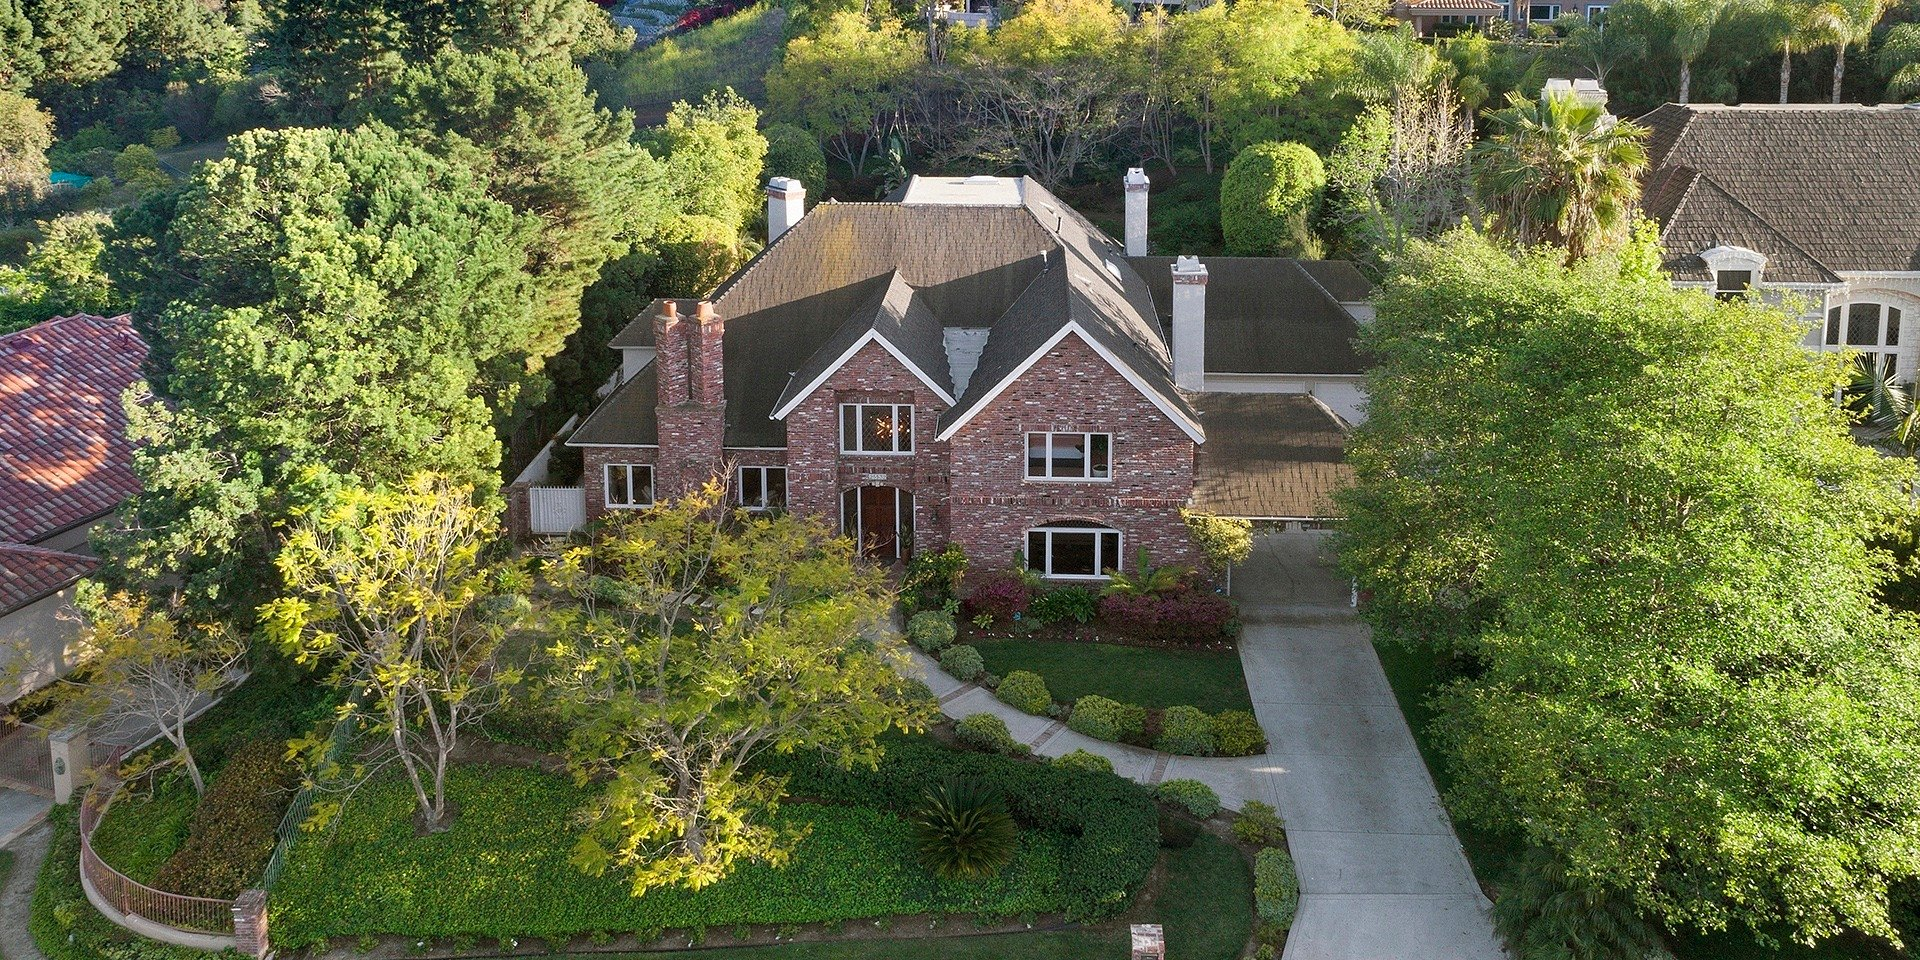 Coldwell Banker Residential Brokerage Lists Laguna Hills Property for $2.295 Million